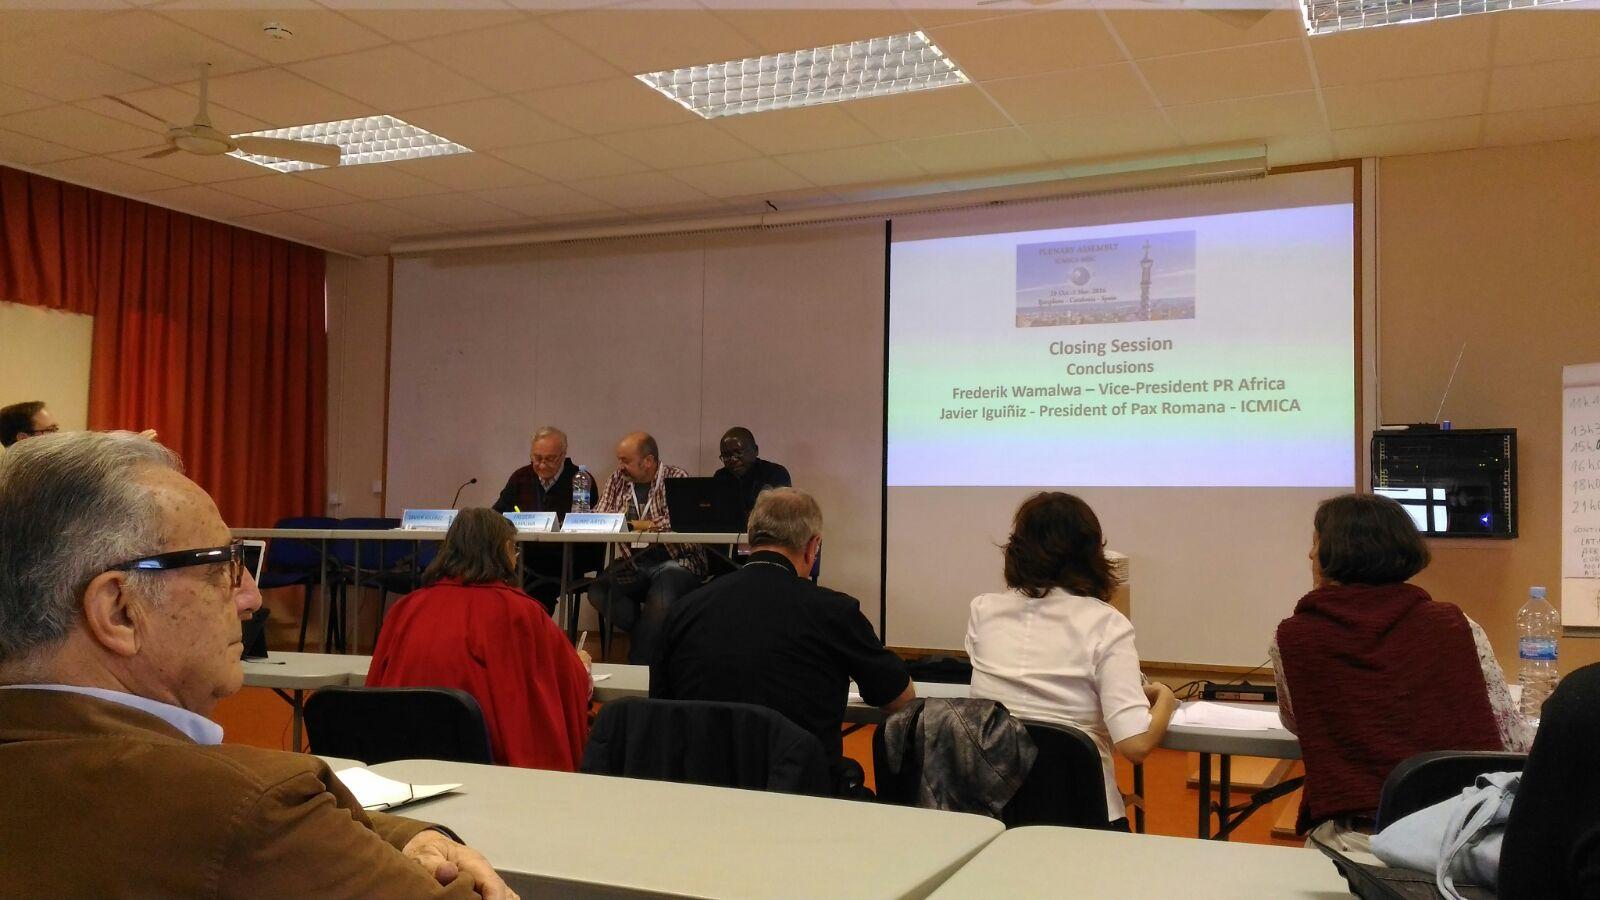 asamblea-plenaria-icmica-miic-pax-romana-2016-profesionales-cristianos-equipo-permanente-2